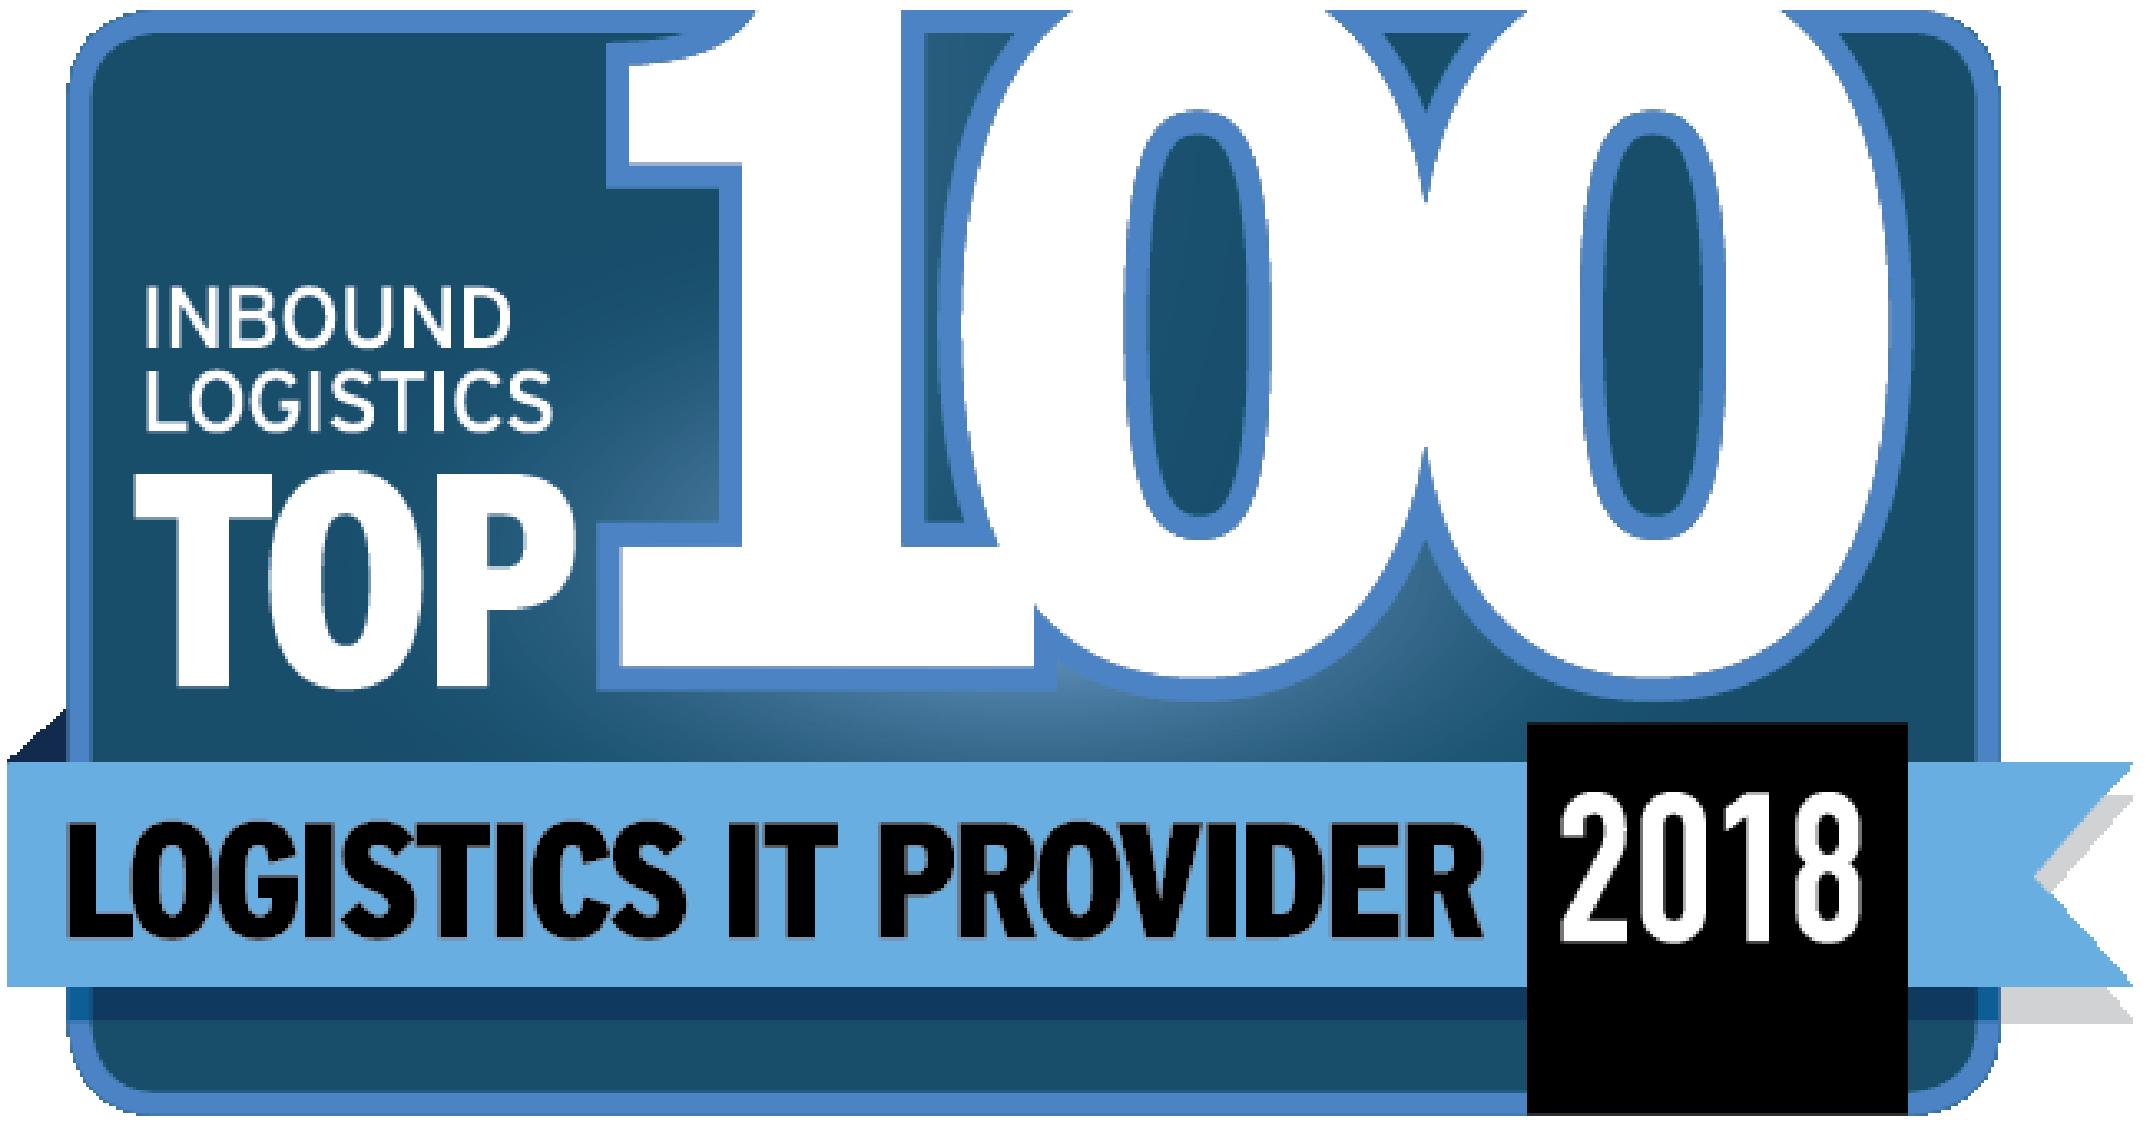 Inbound Logistics Top 100